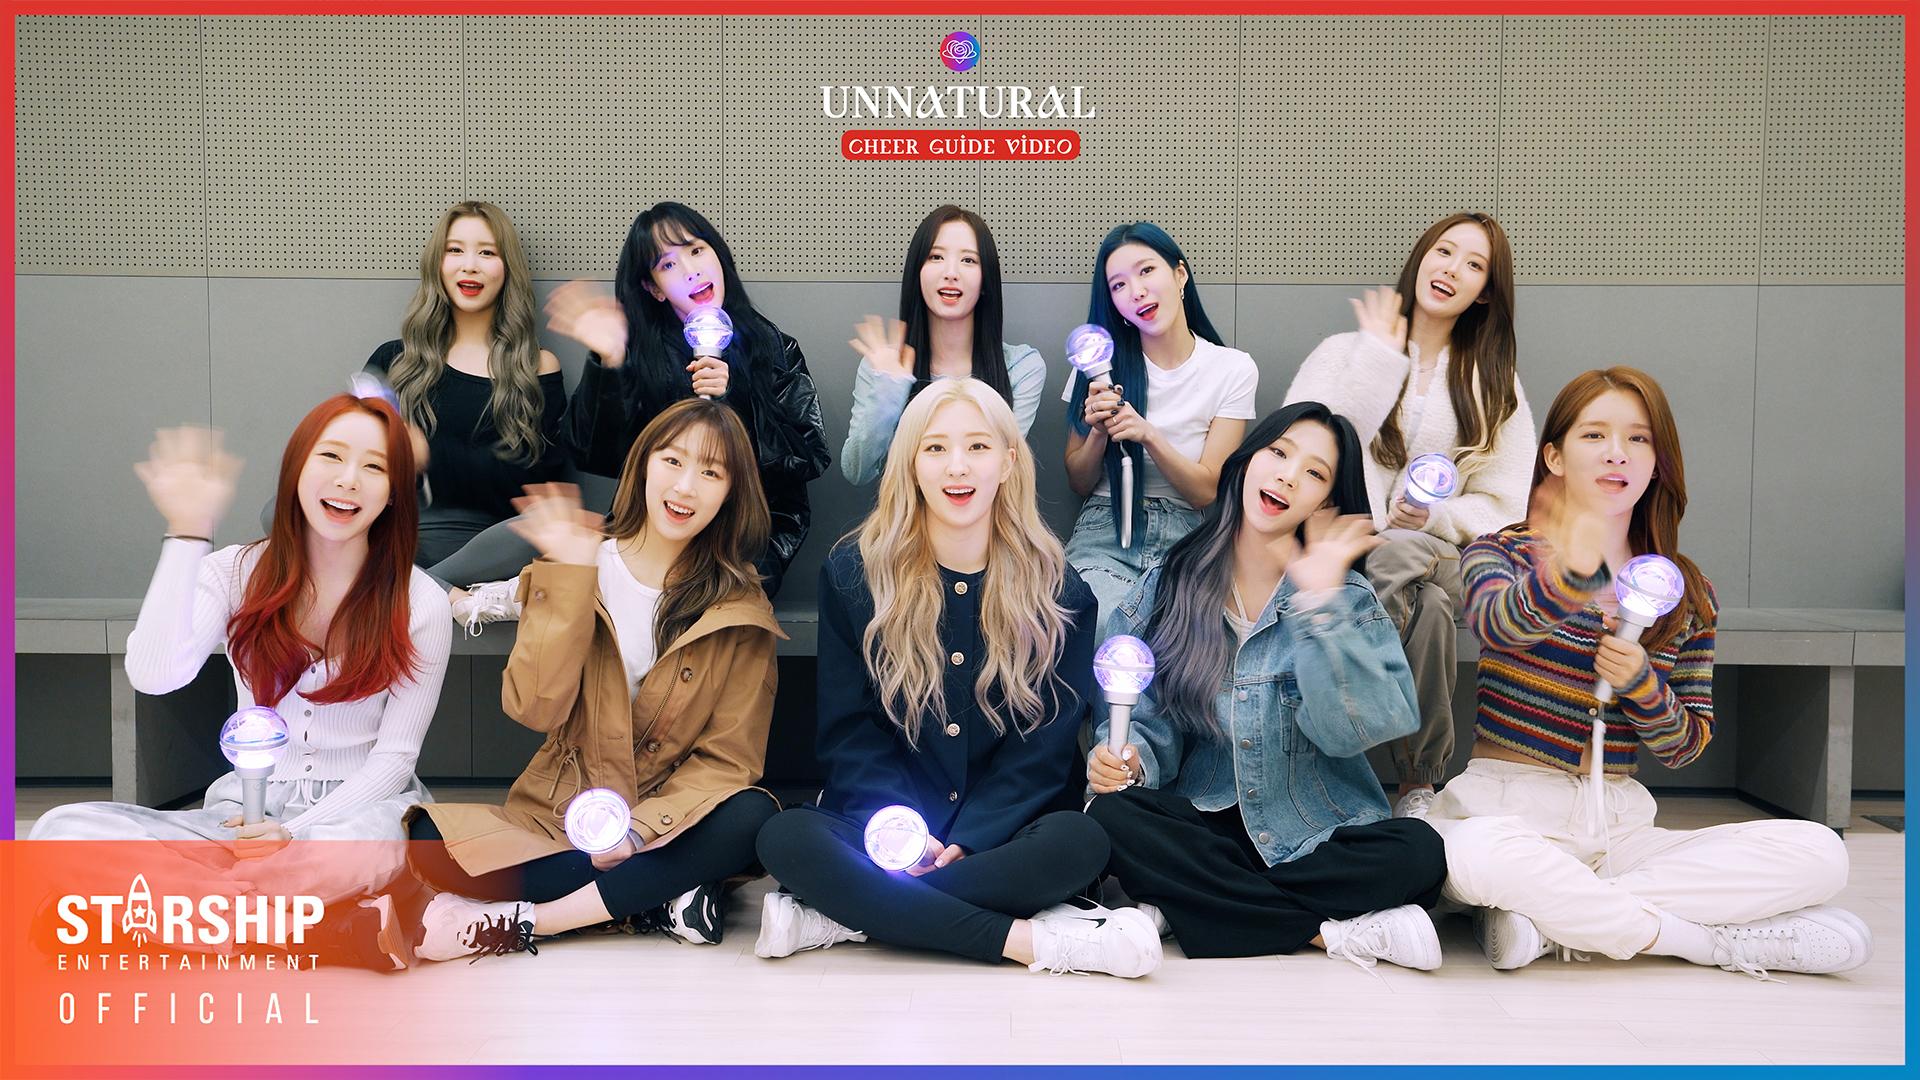 [Special Clip] 우주소녀(WJSN) - UNNATURAL 응원법